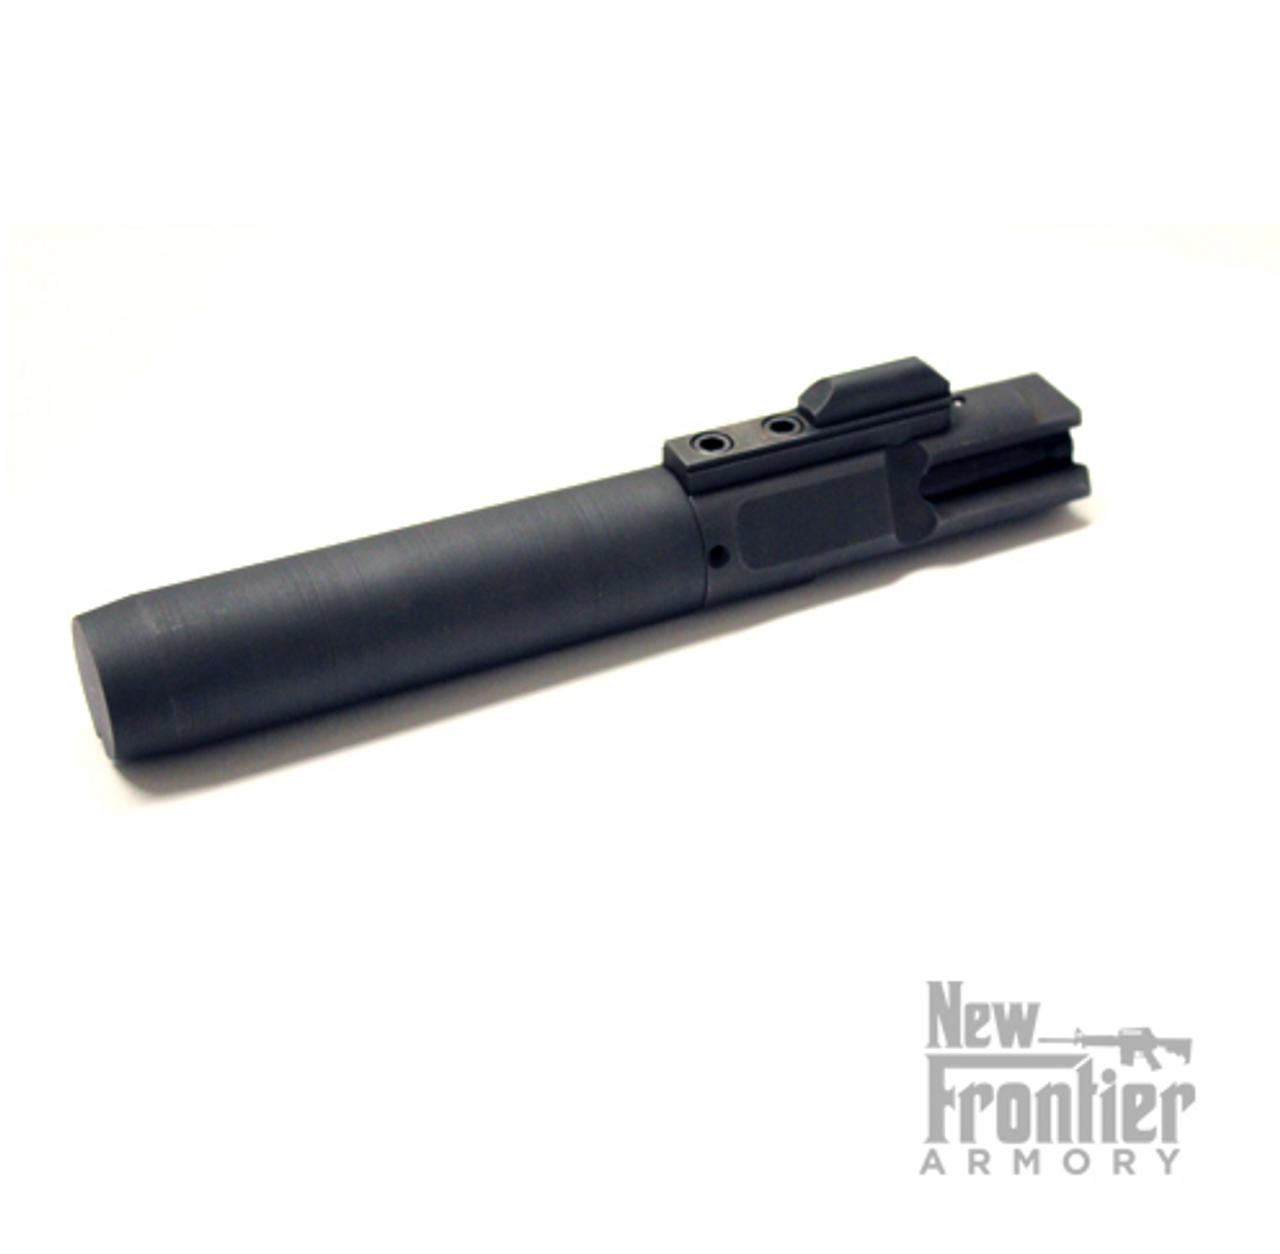 New Frontier Armory AR-9 Modular 9mm BCG (Glock & Colt